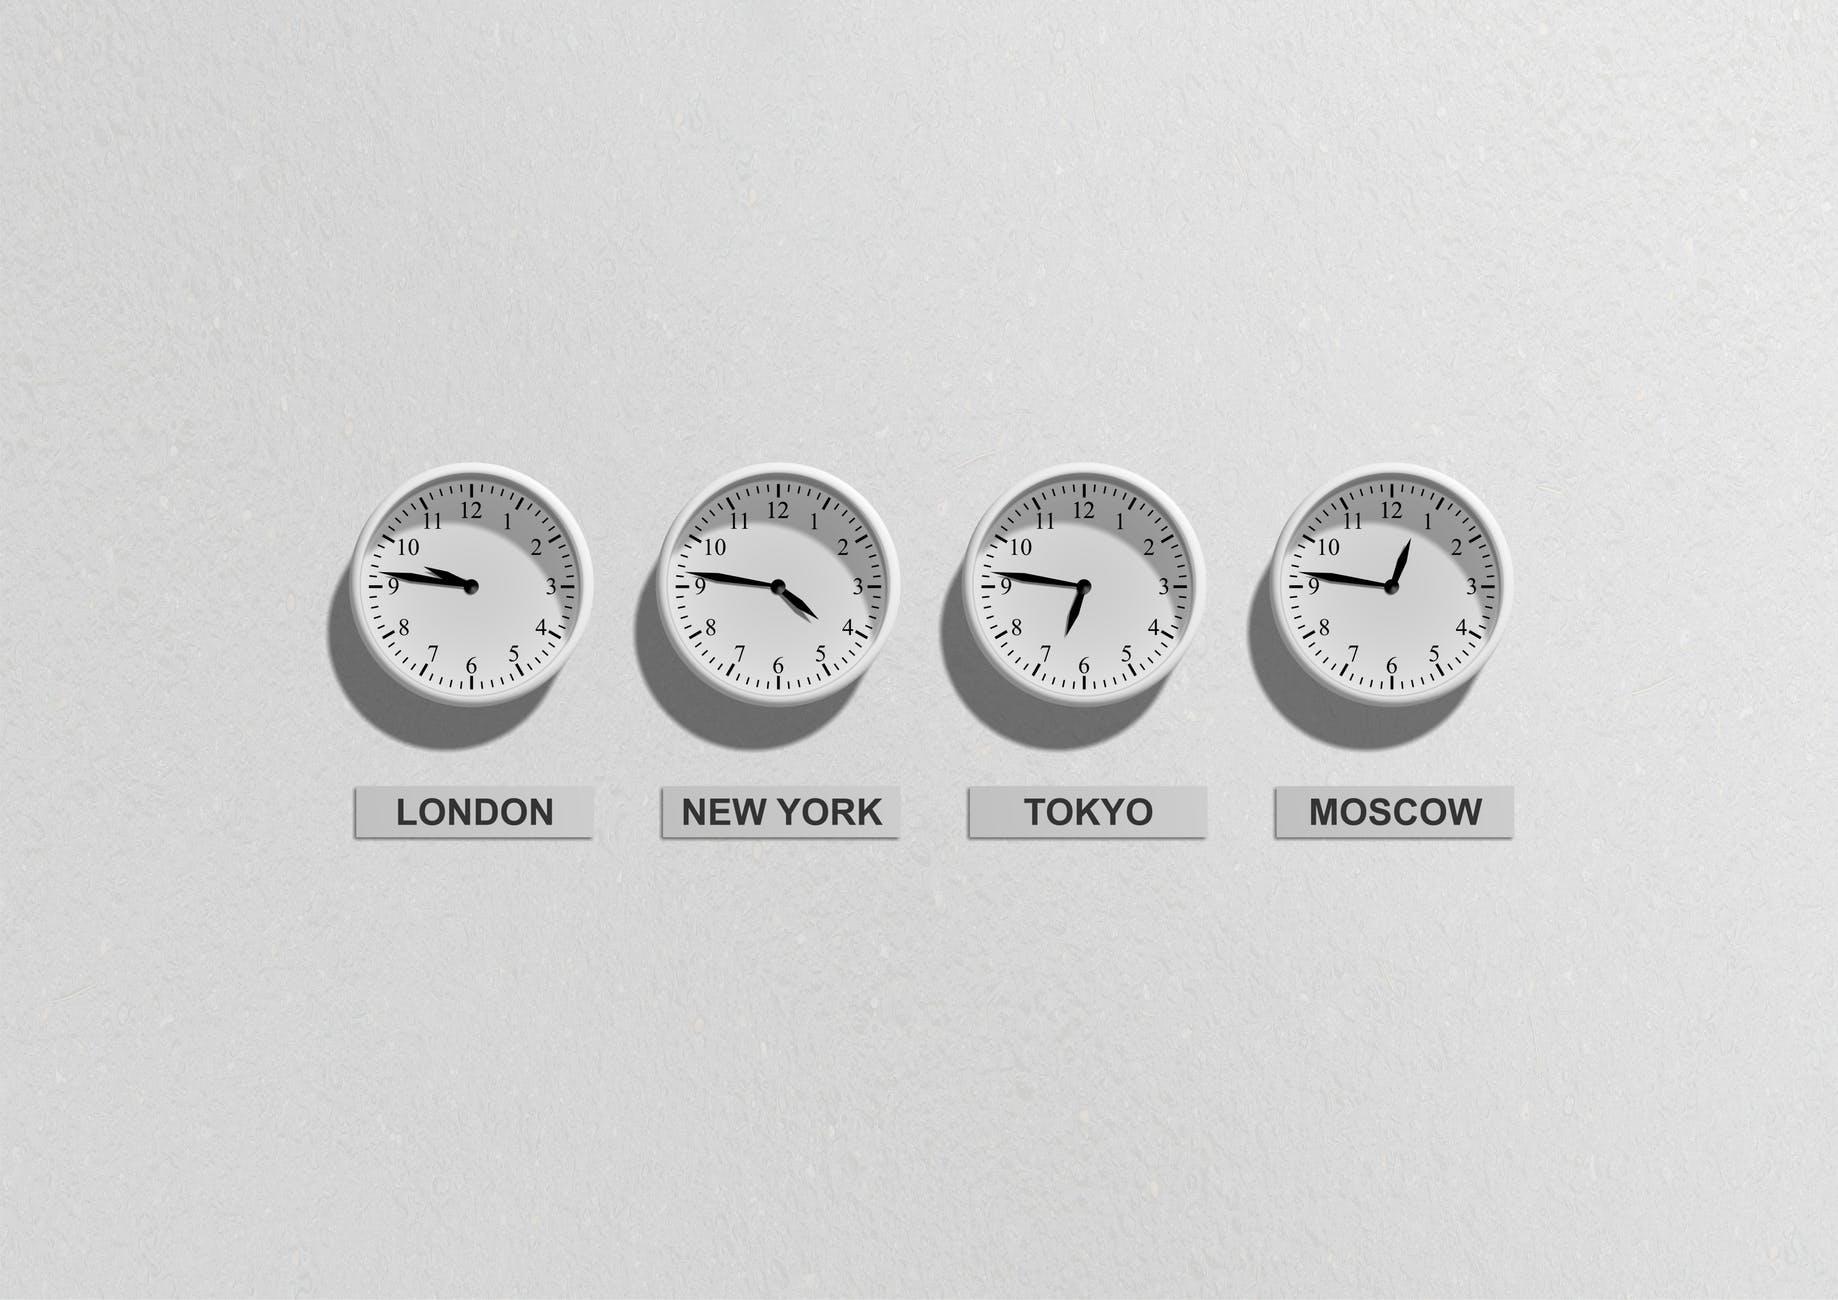 Business time clock clocks 48770